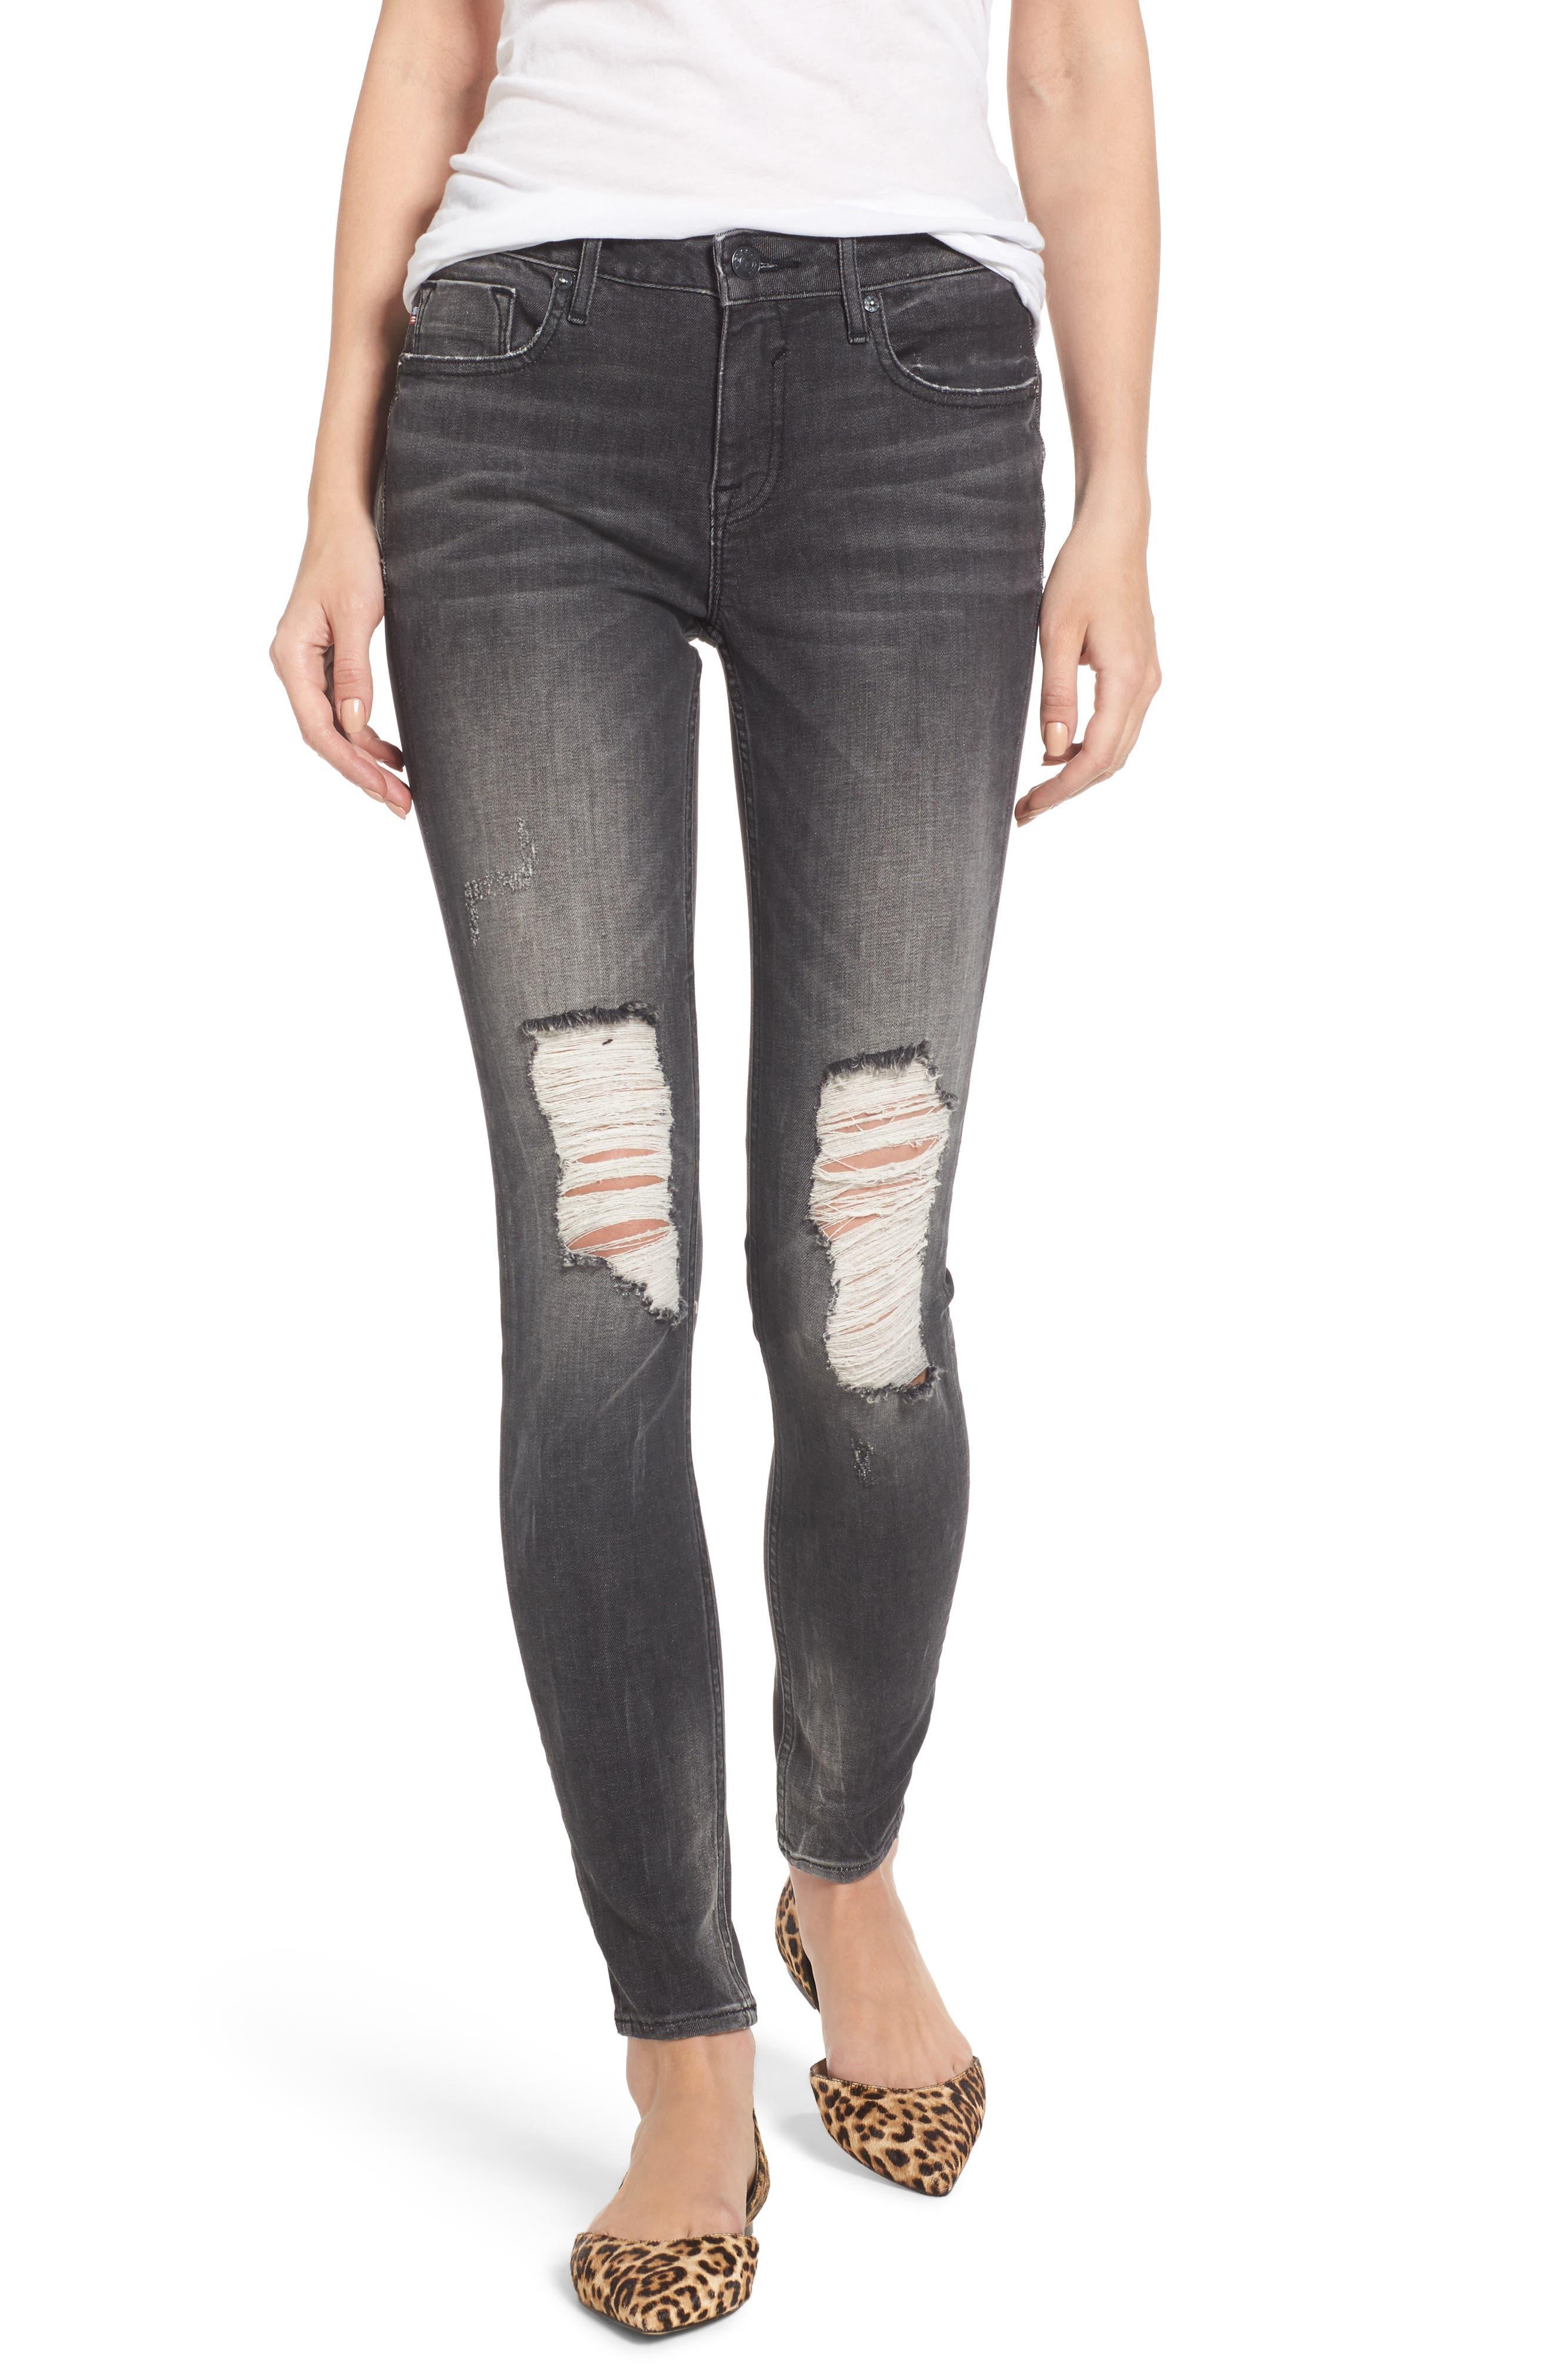 Jagger Ripped Skinny Jeans,                             Main thumbnail 1, color,                             020